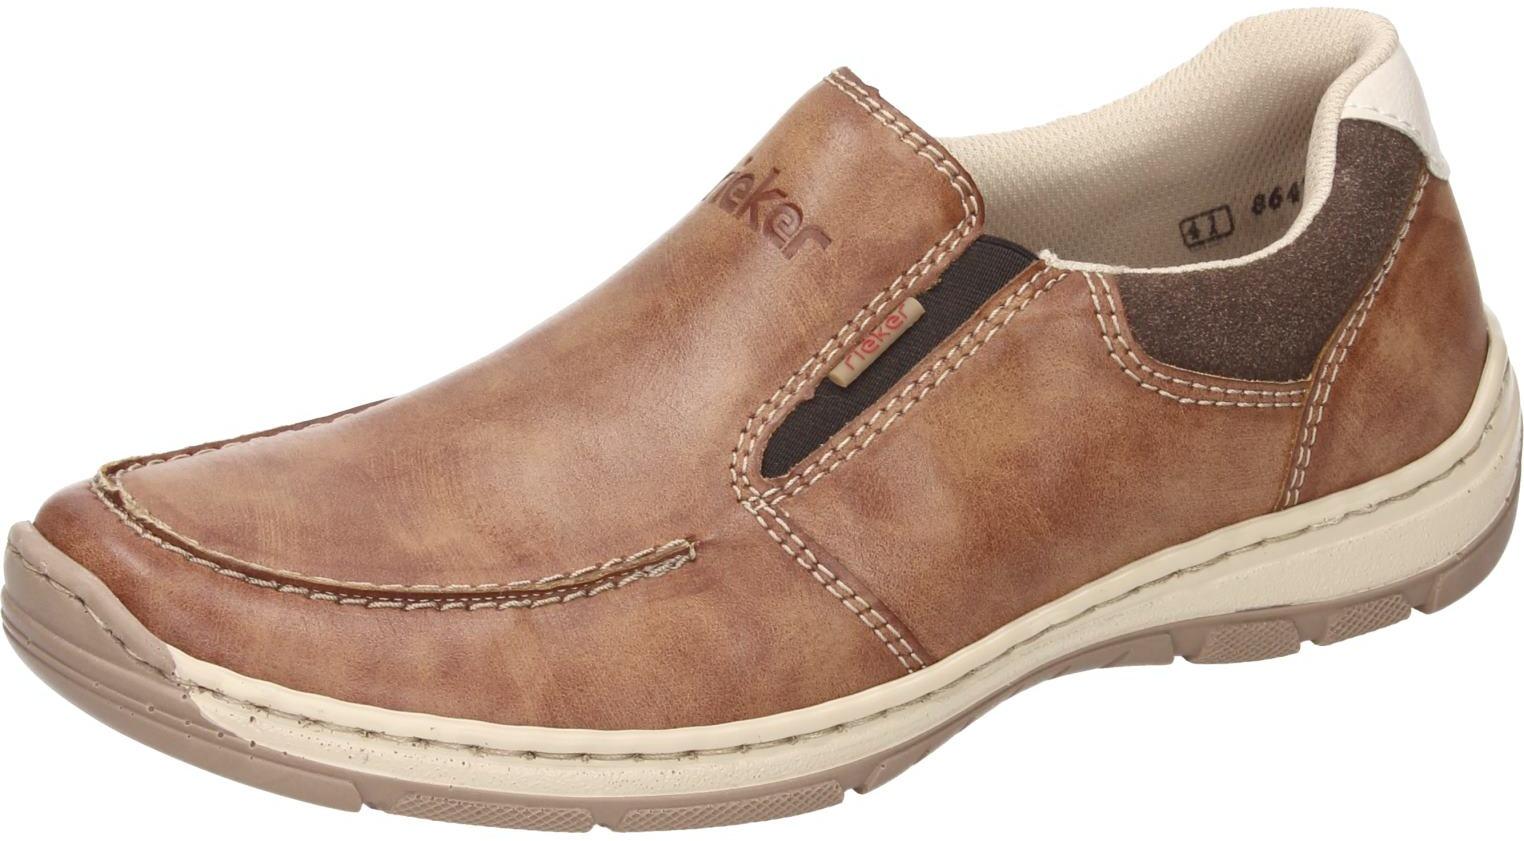 Details zu Rieker Herren Schuhe Herren Slipper braun Synthetik